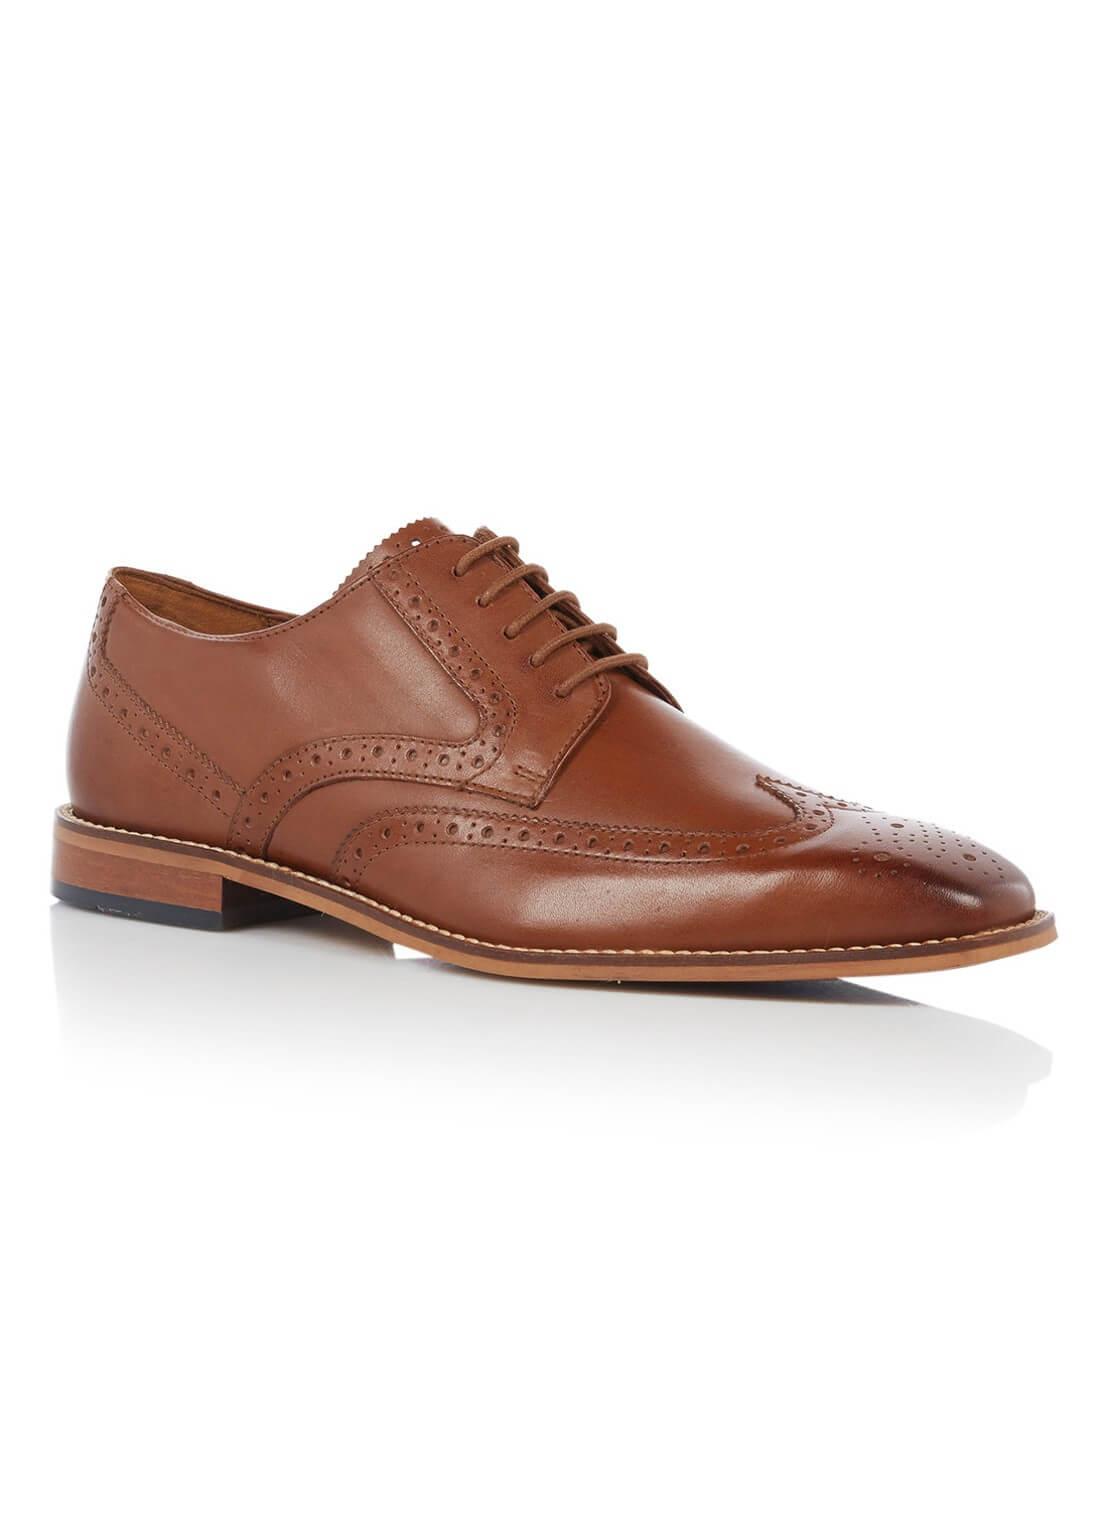 Shoes - Mr.Draper